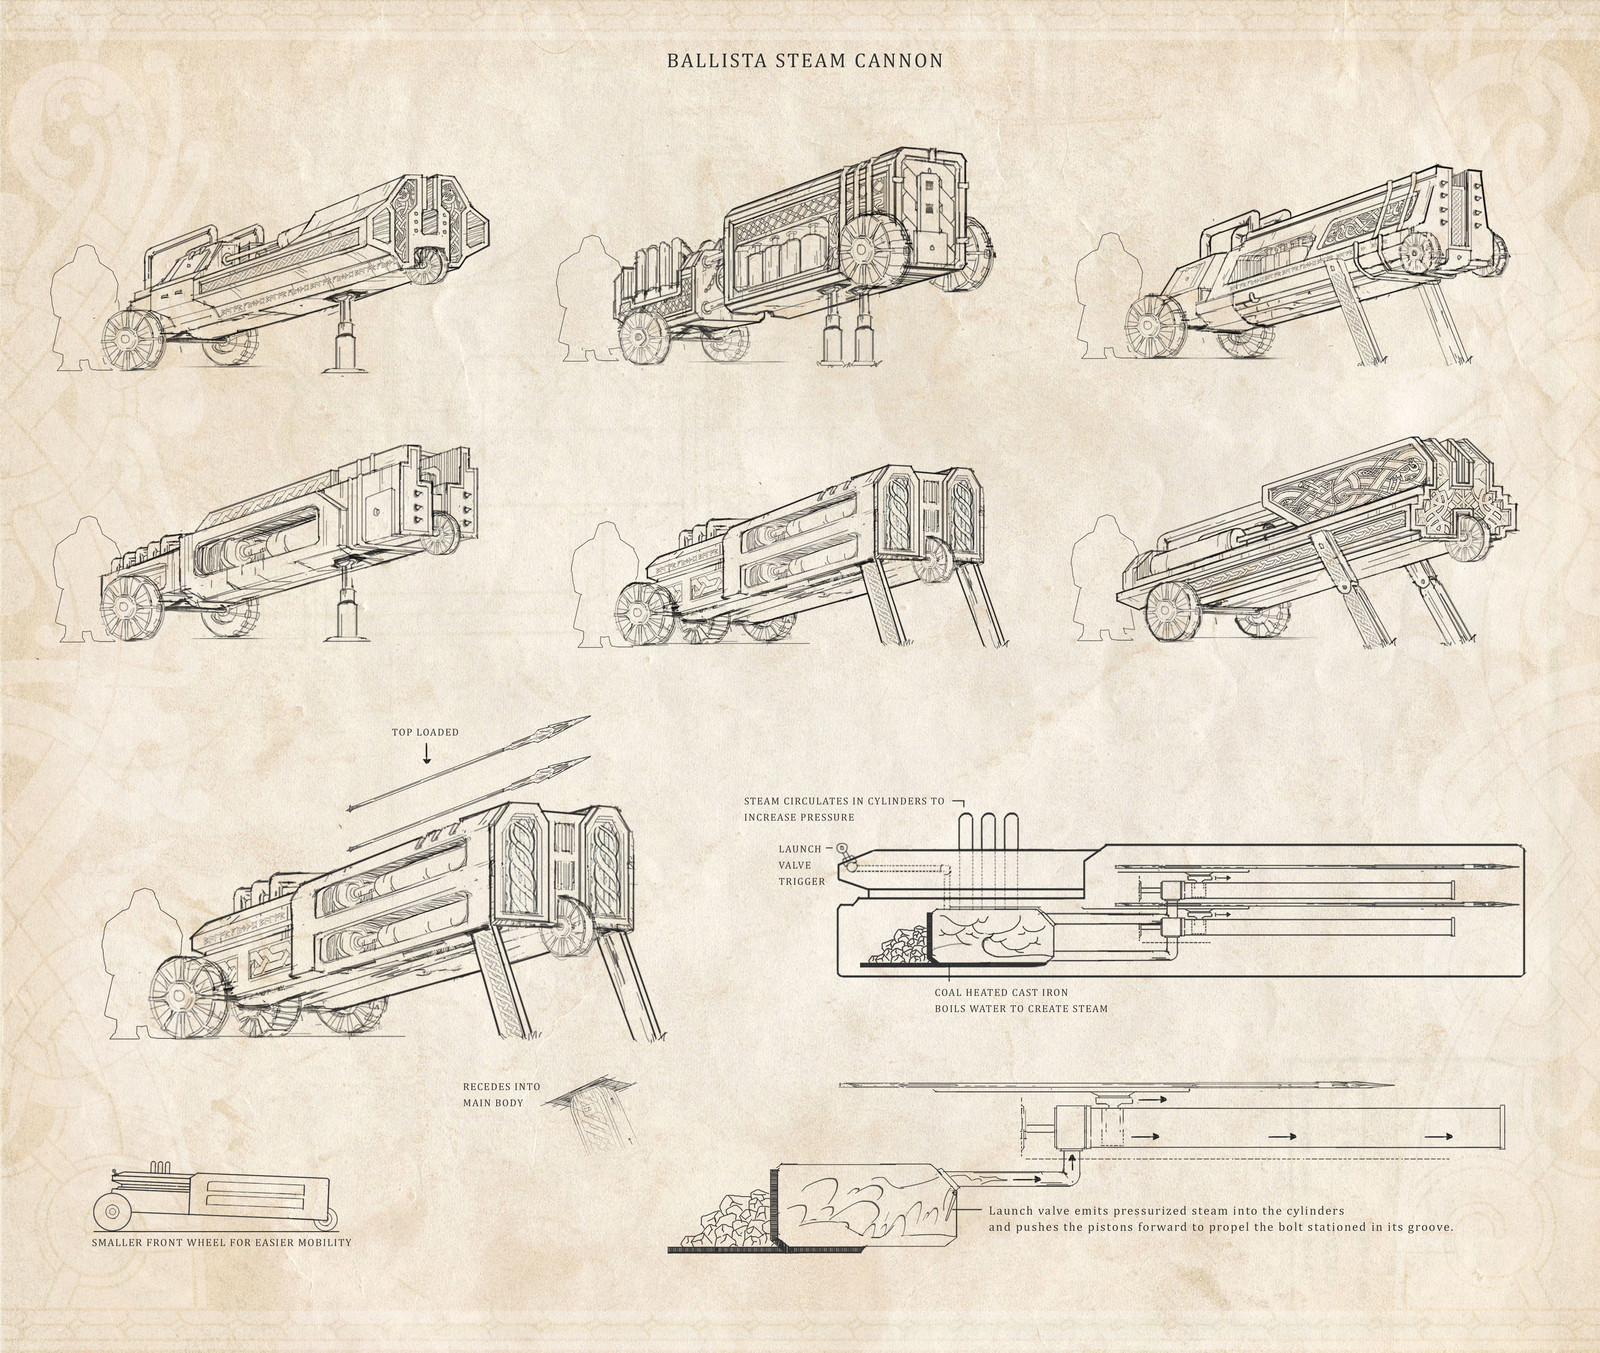 Ballista Steam Cannon